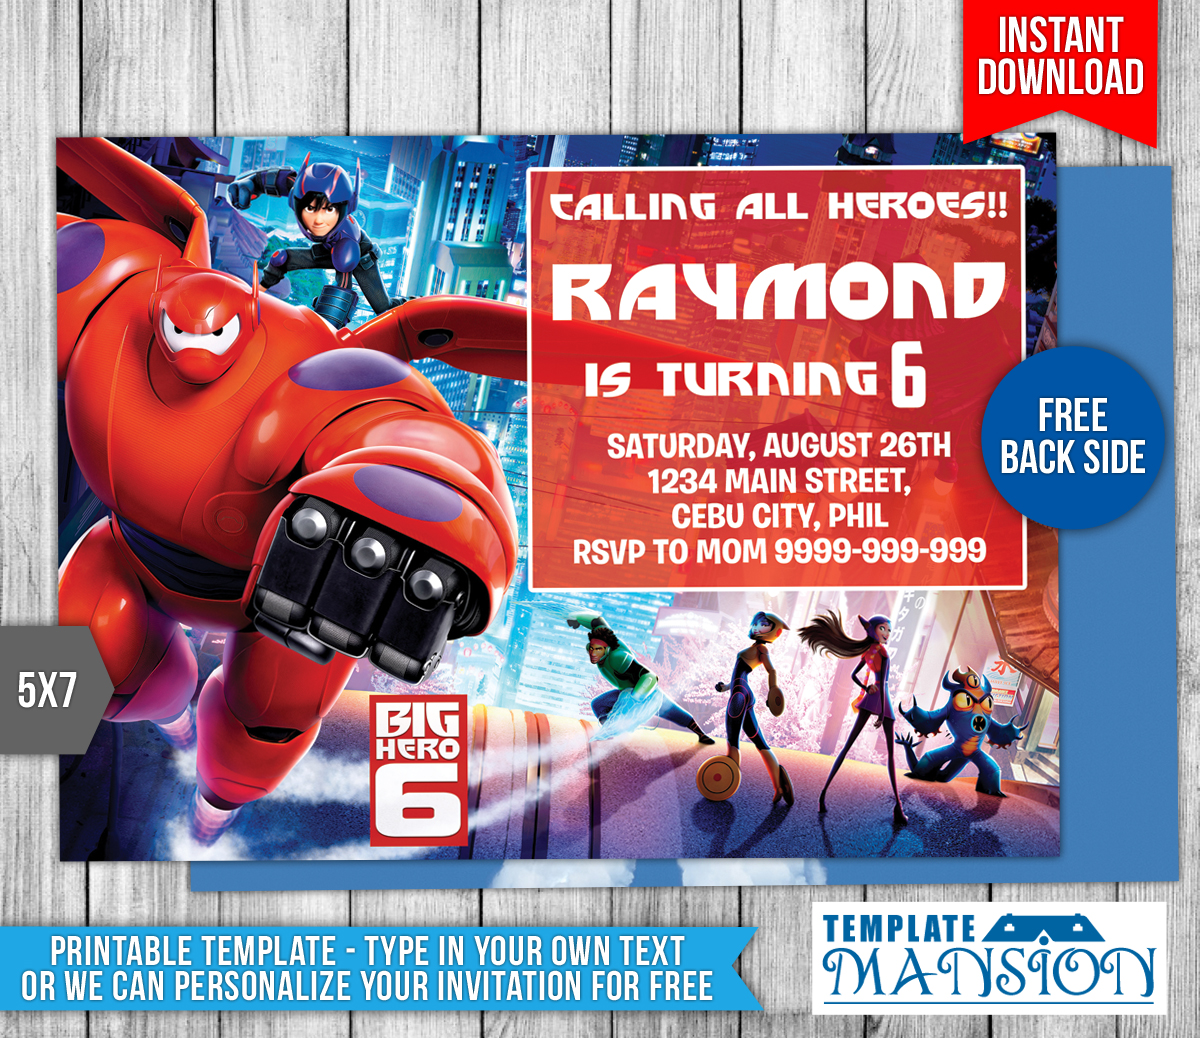 Big Hero 6 Birthday Invitation 2 By Templatemansion